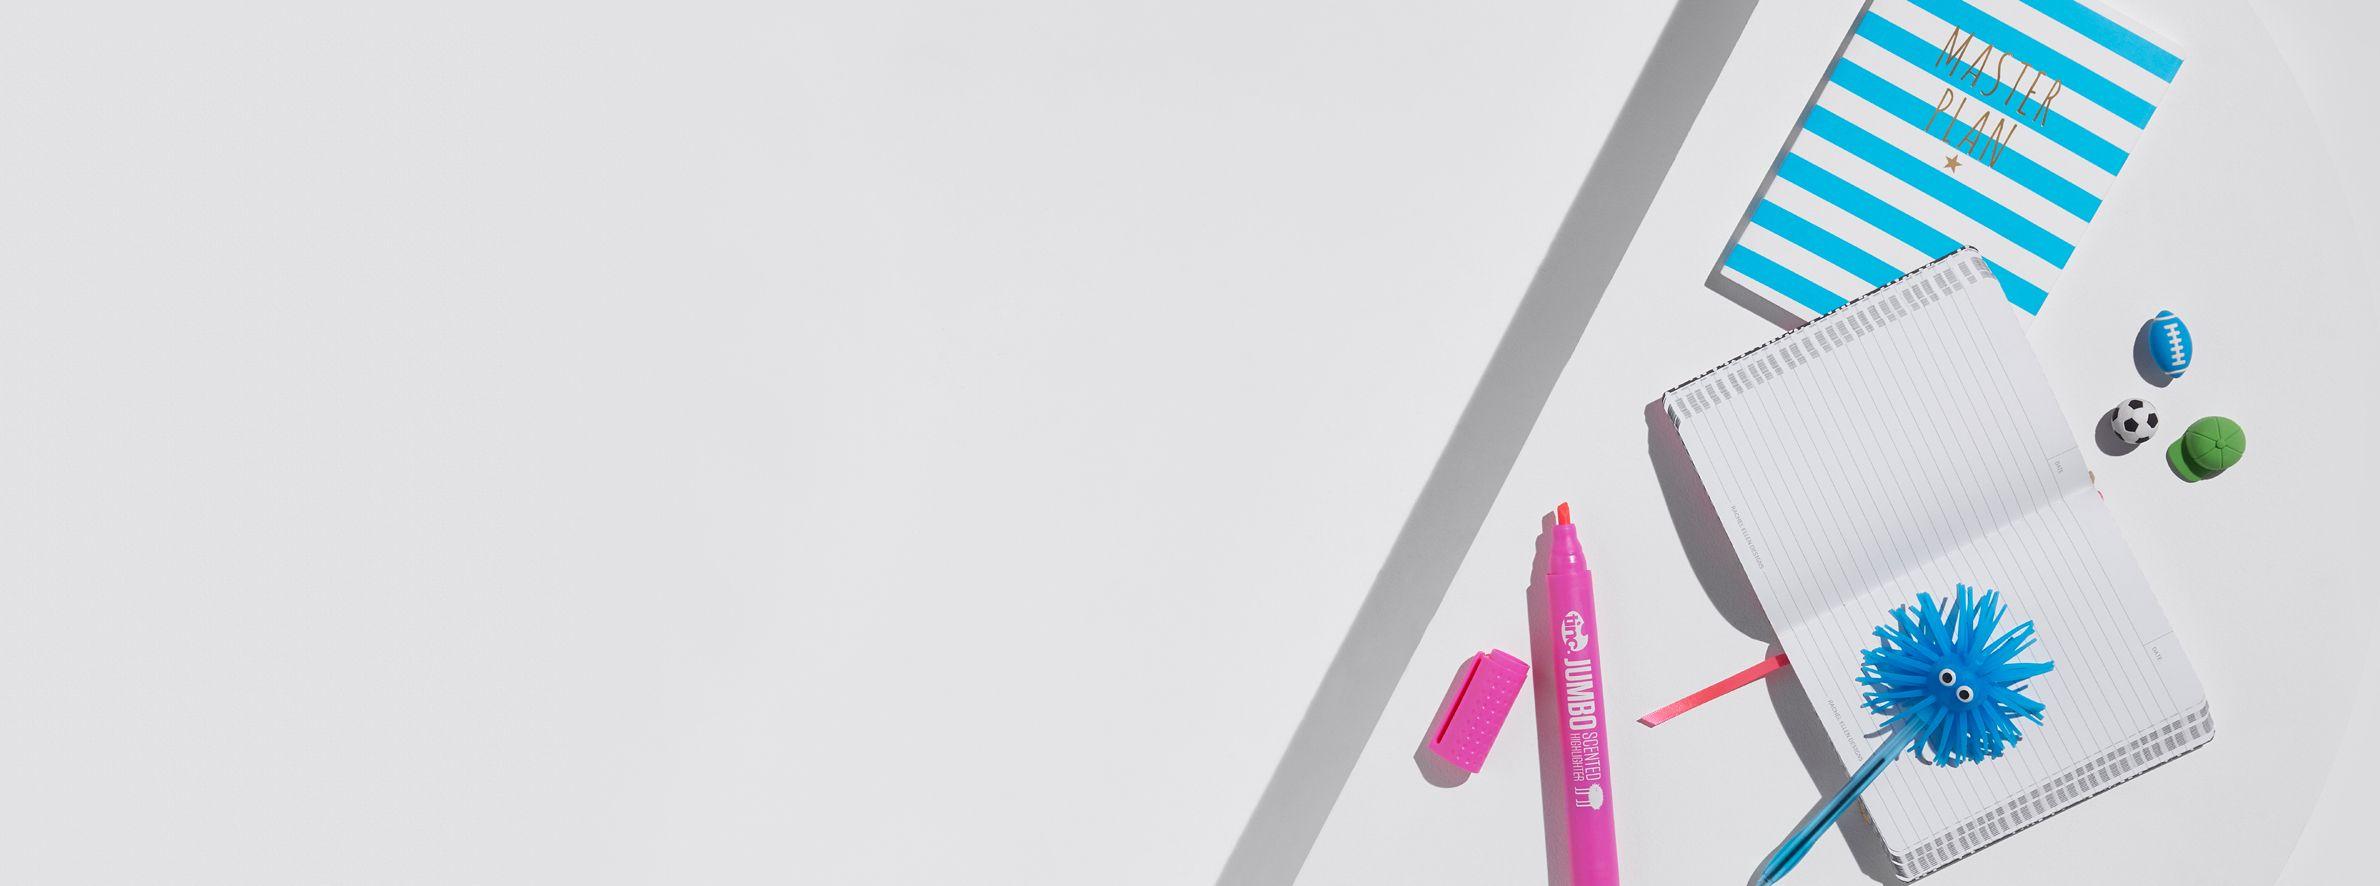 Pens & Pencils | Ball Point, Fountain, Coloured Pens | John Lewis